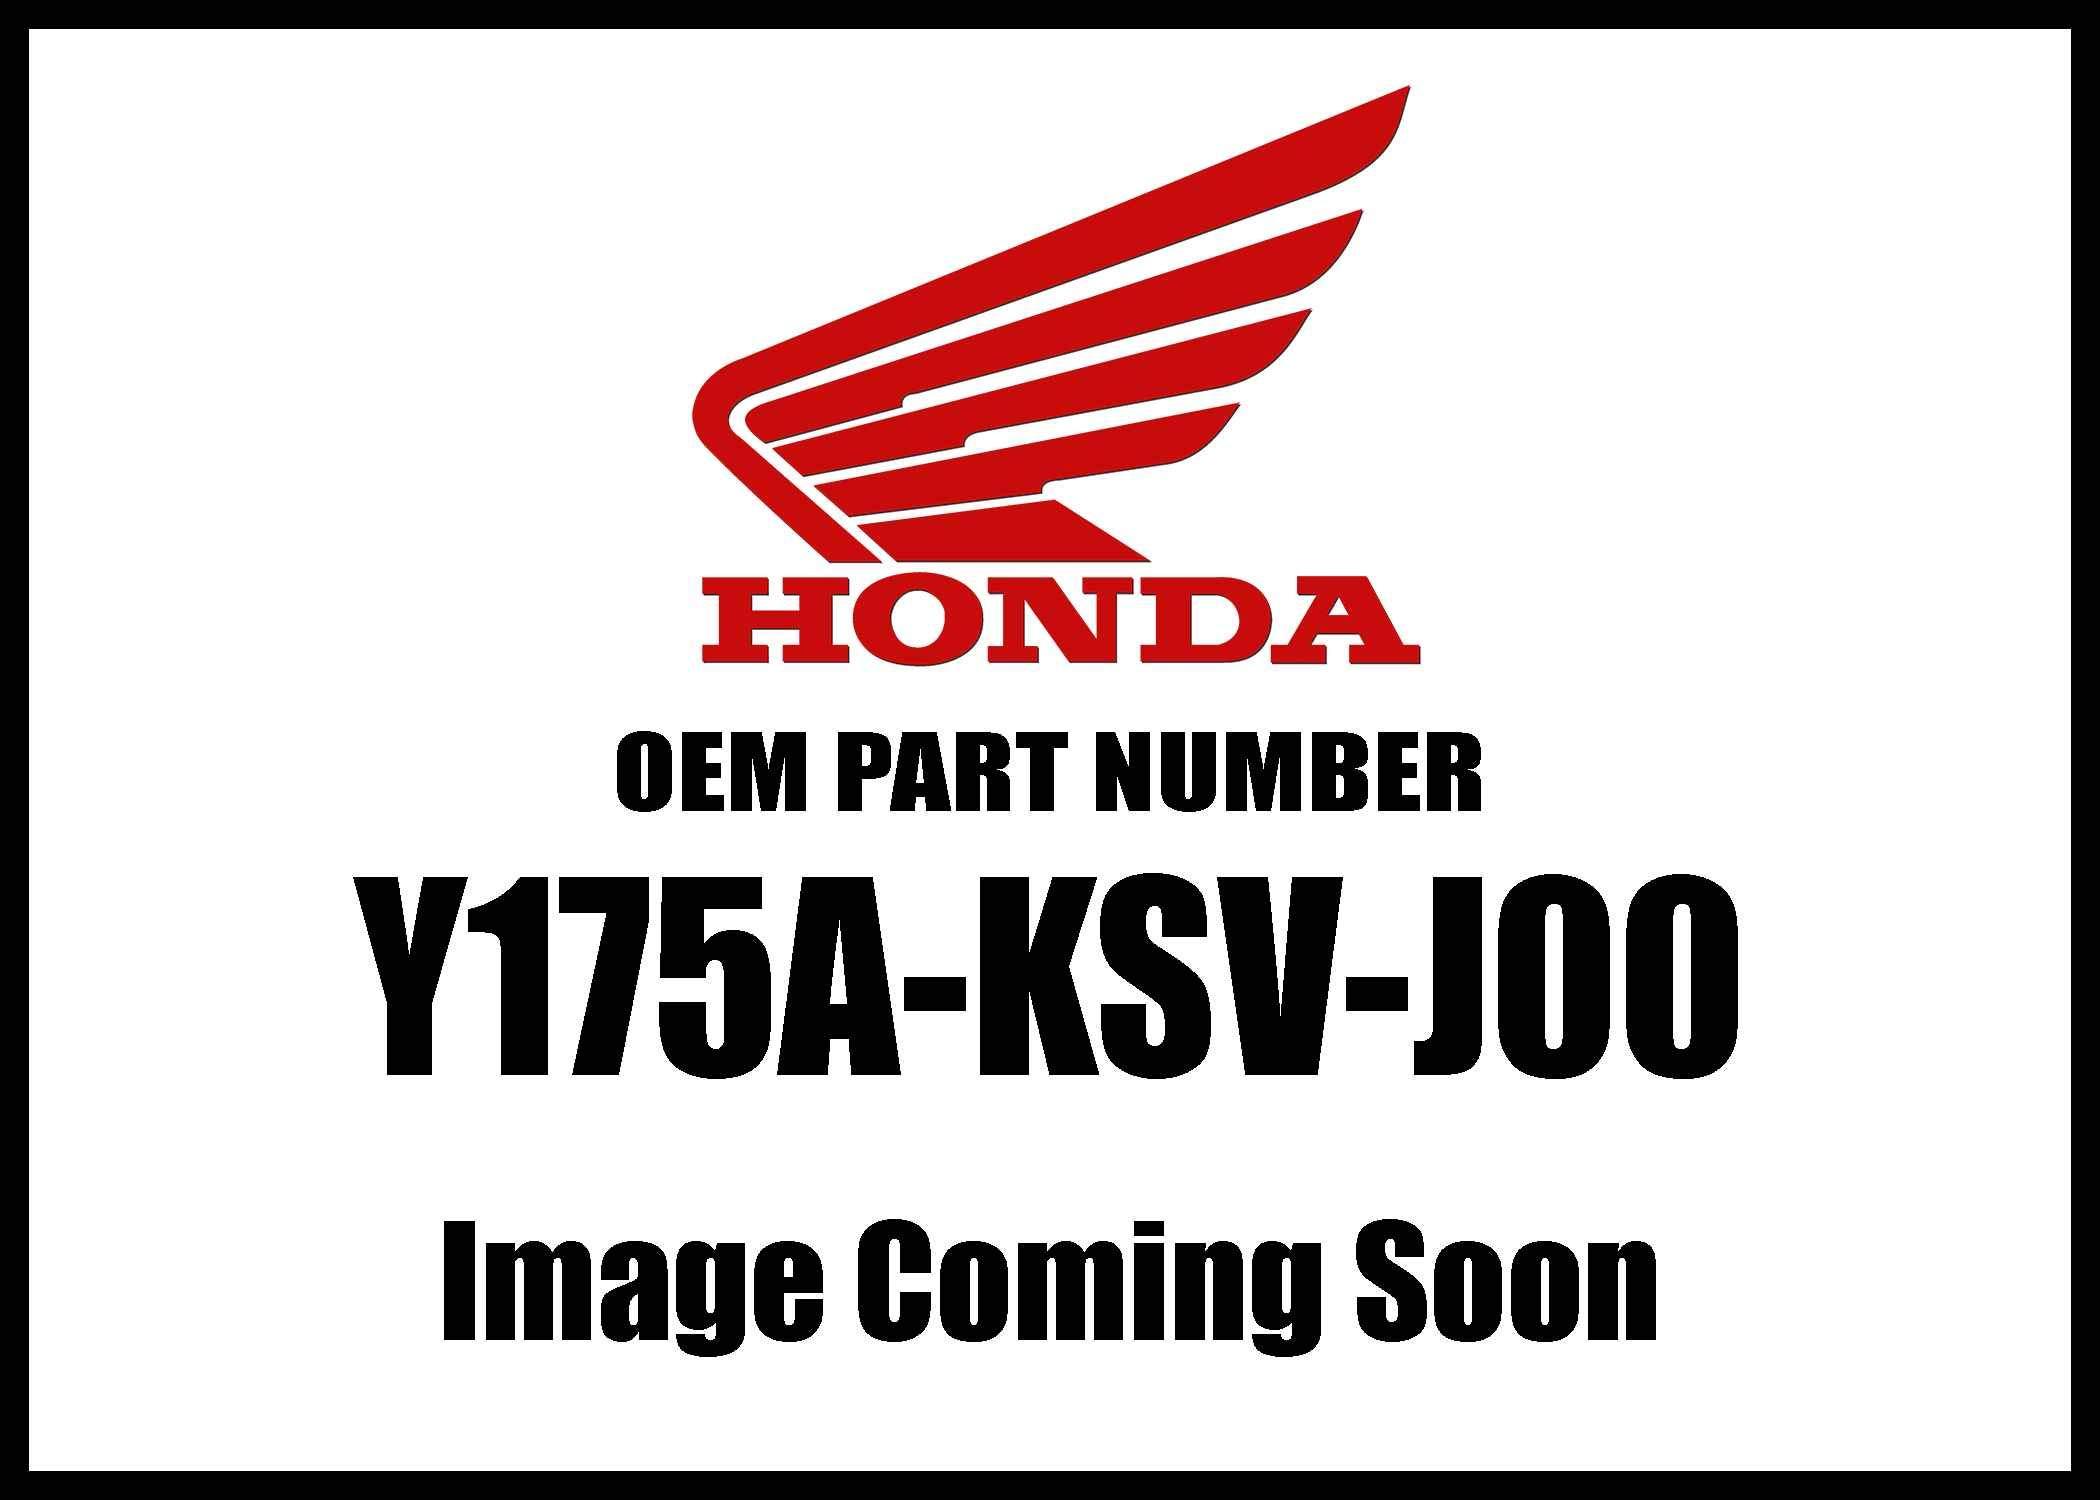 Honda Mc-Accy Trim A Fuel Tank Y175a-Ksv-J00 New Oem